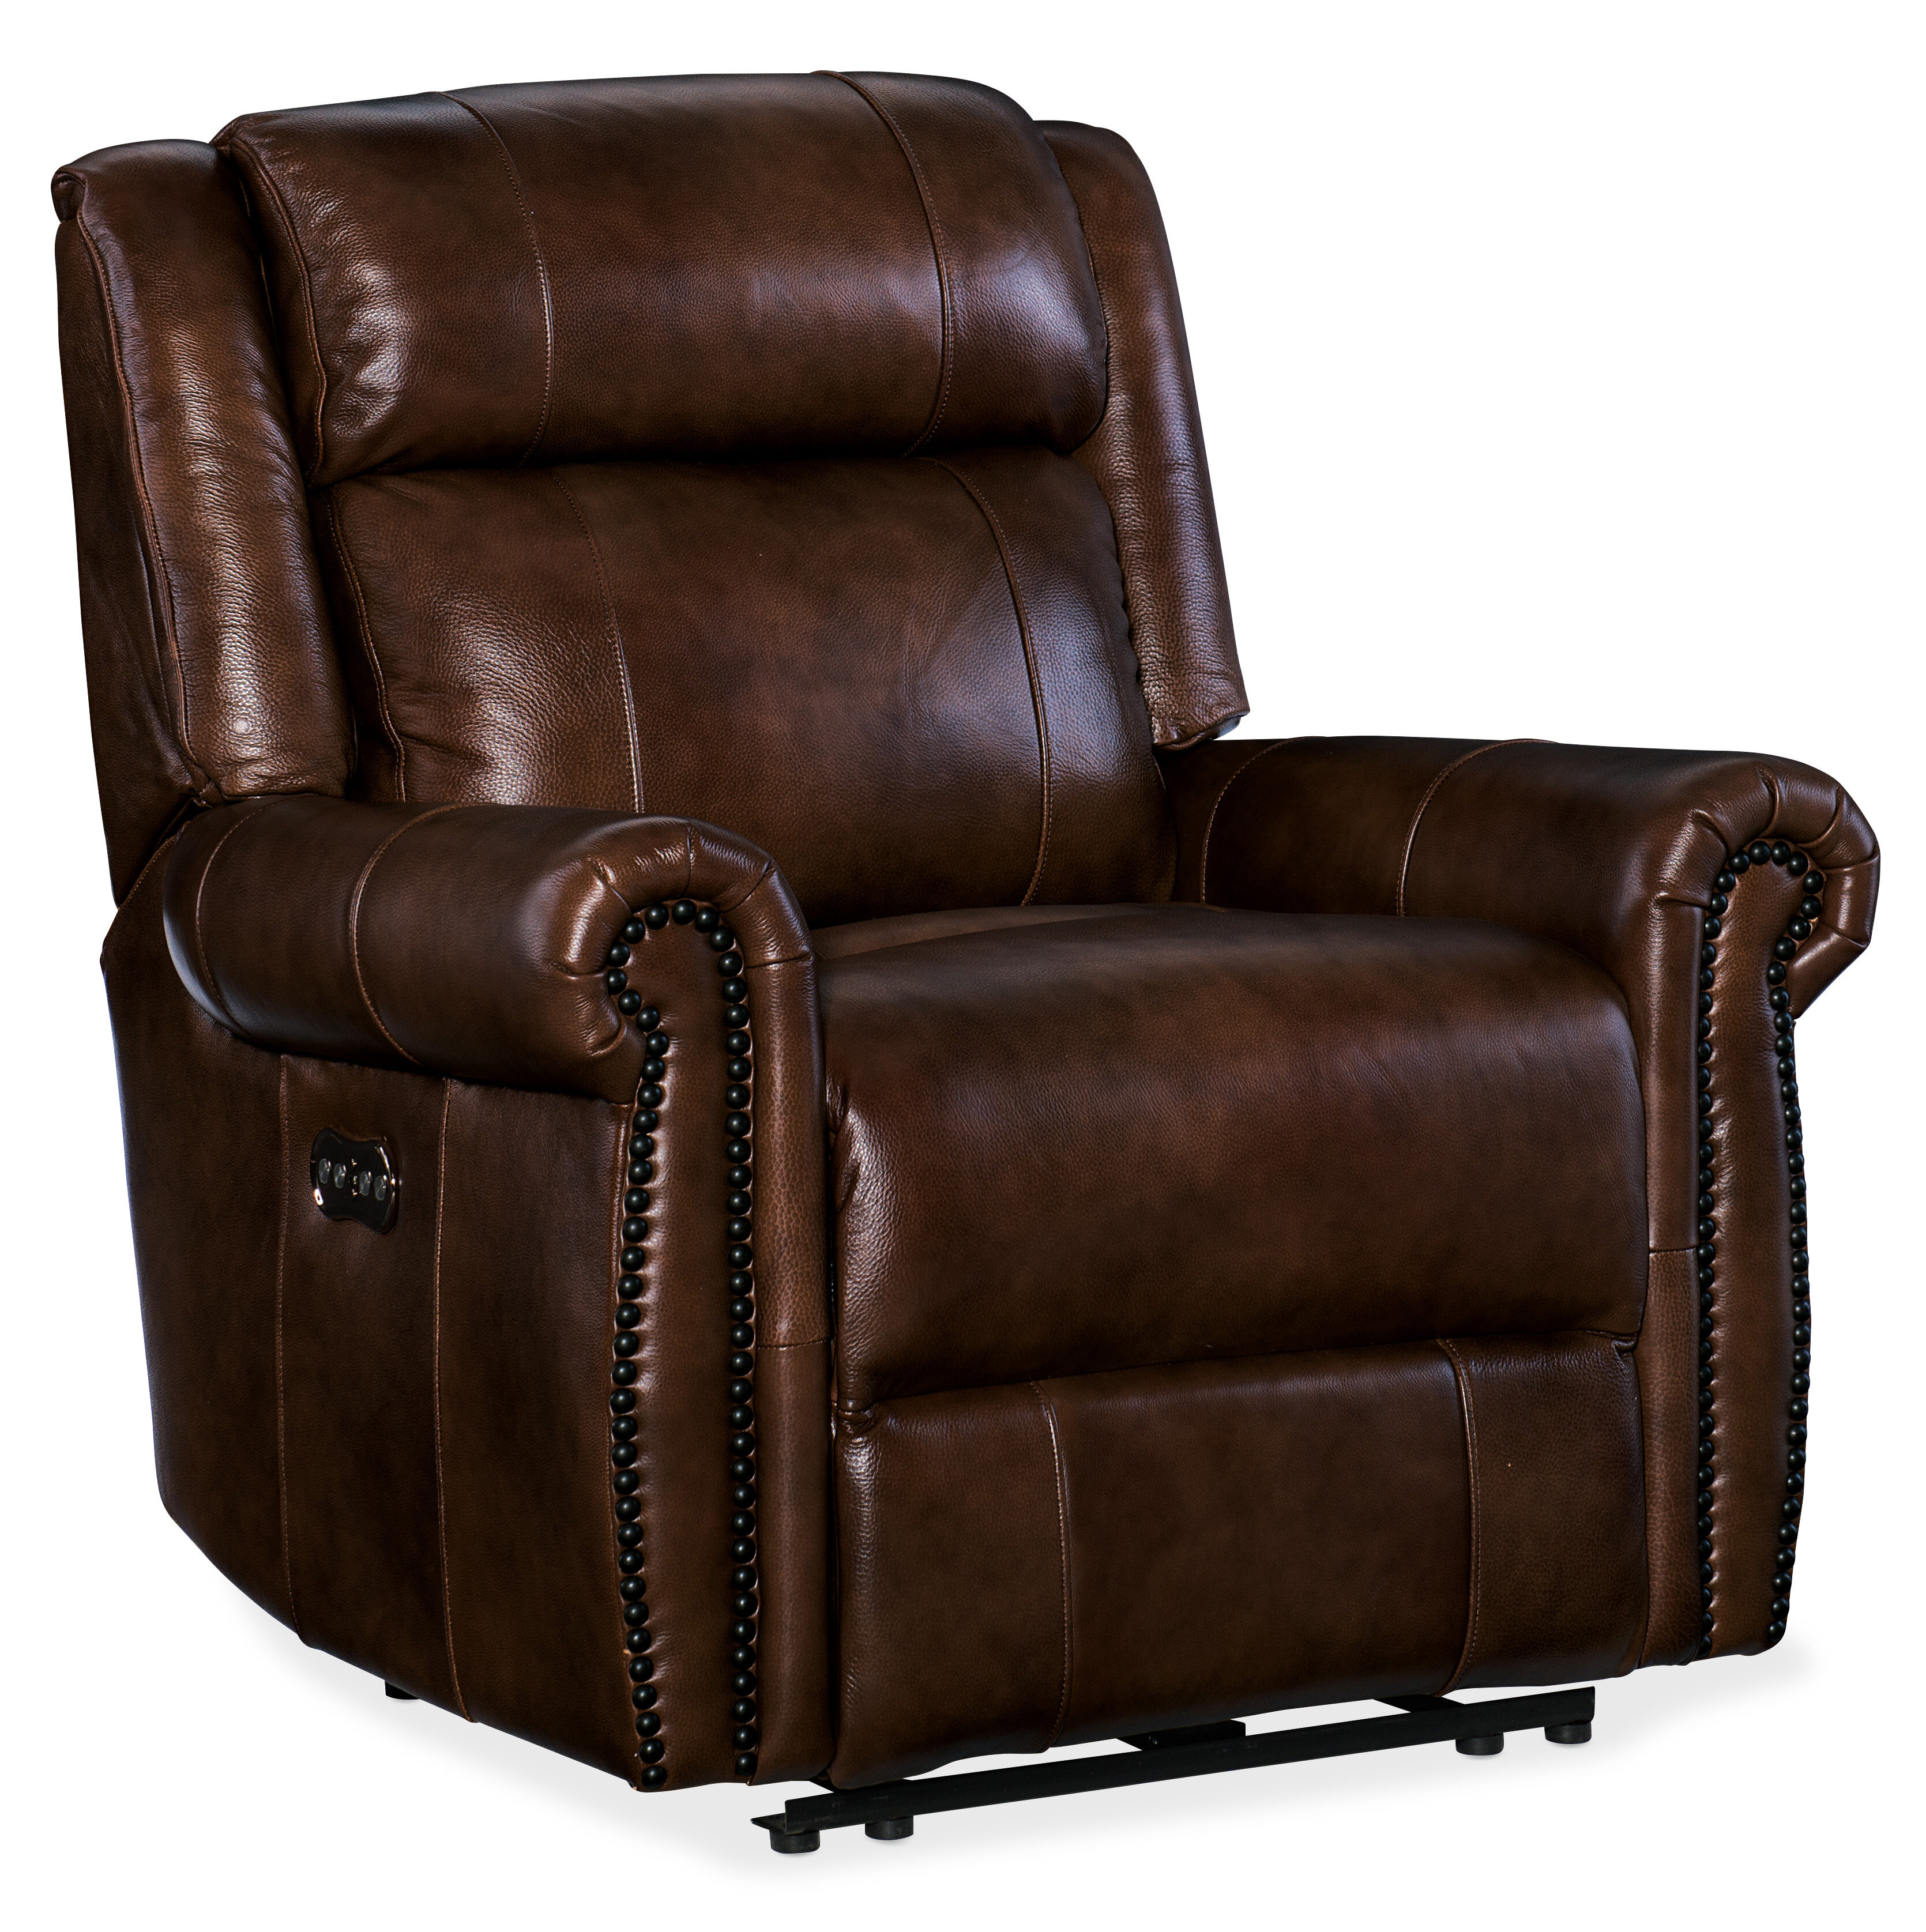 Superbe Hooker Furniture Esme Leather Power Recliner With Power Headrest | Wayfair